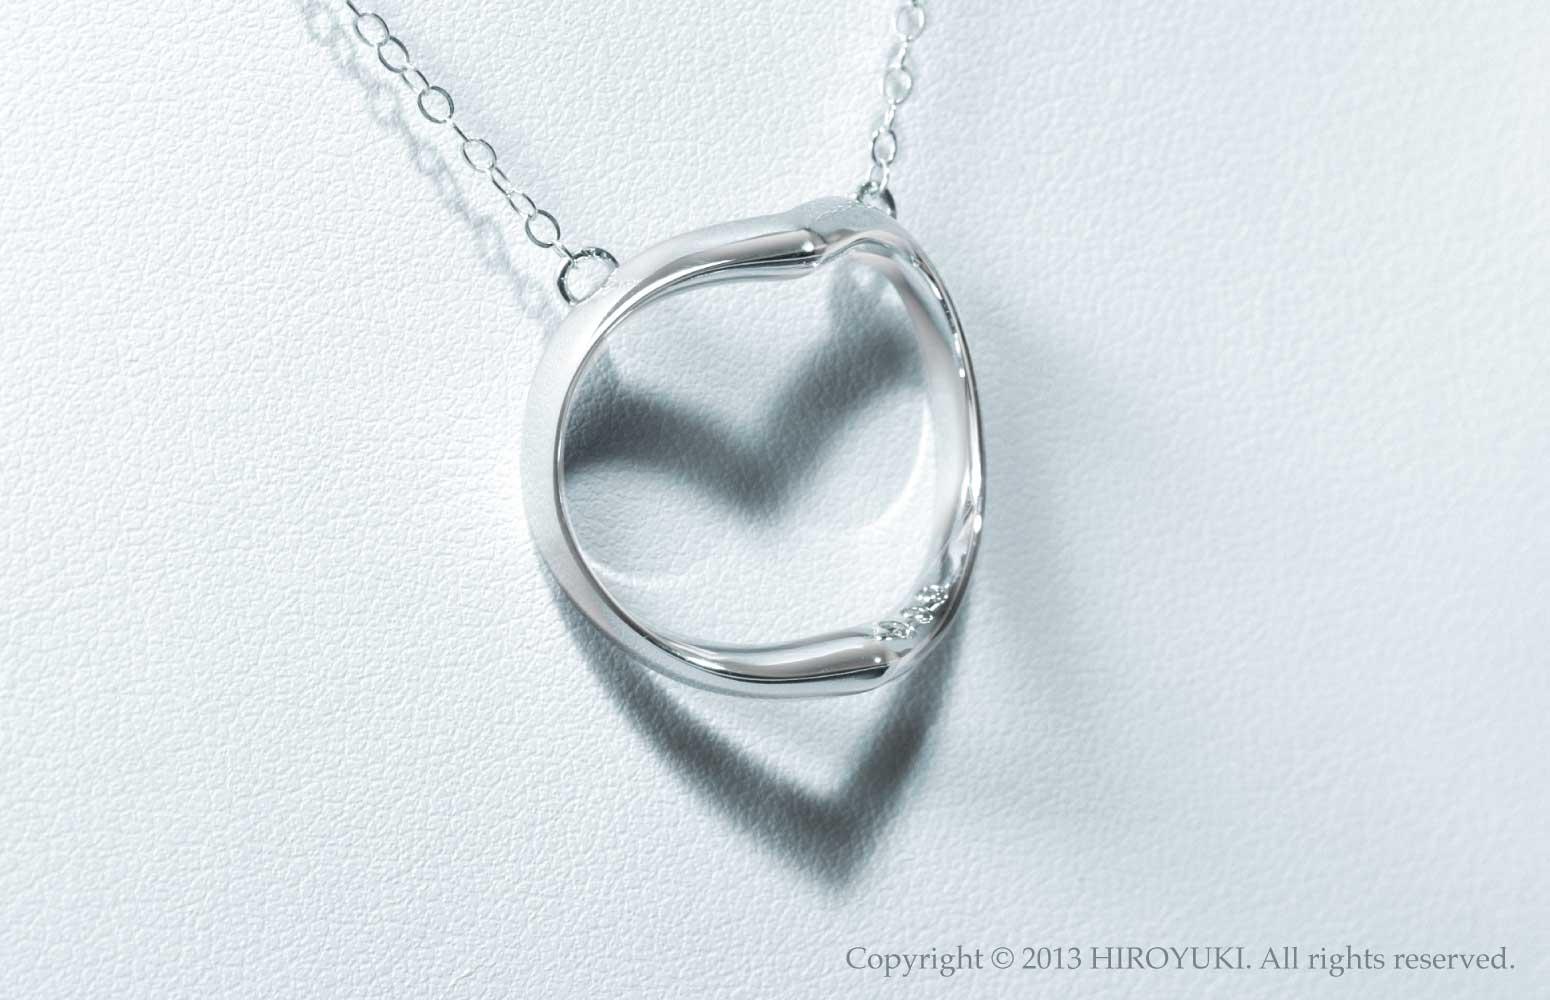 Hiroyuki Launches Shadow Heart Innovative Jewelry Casts